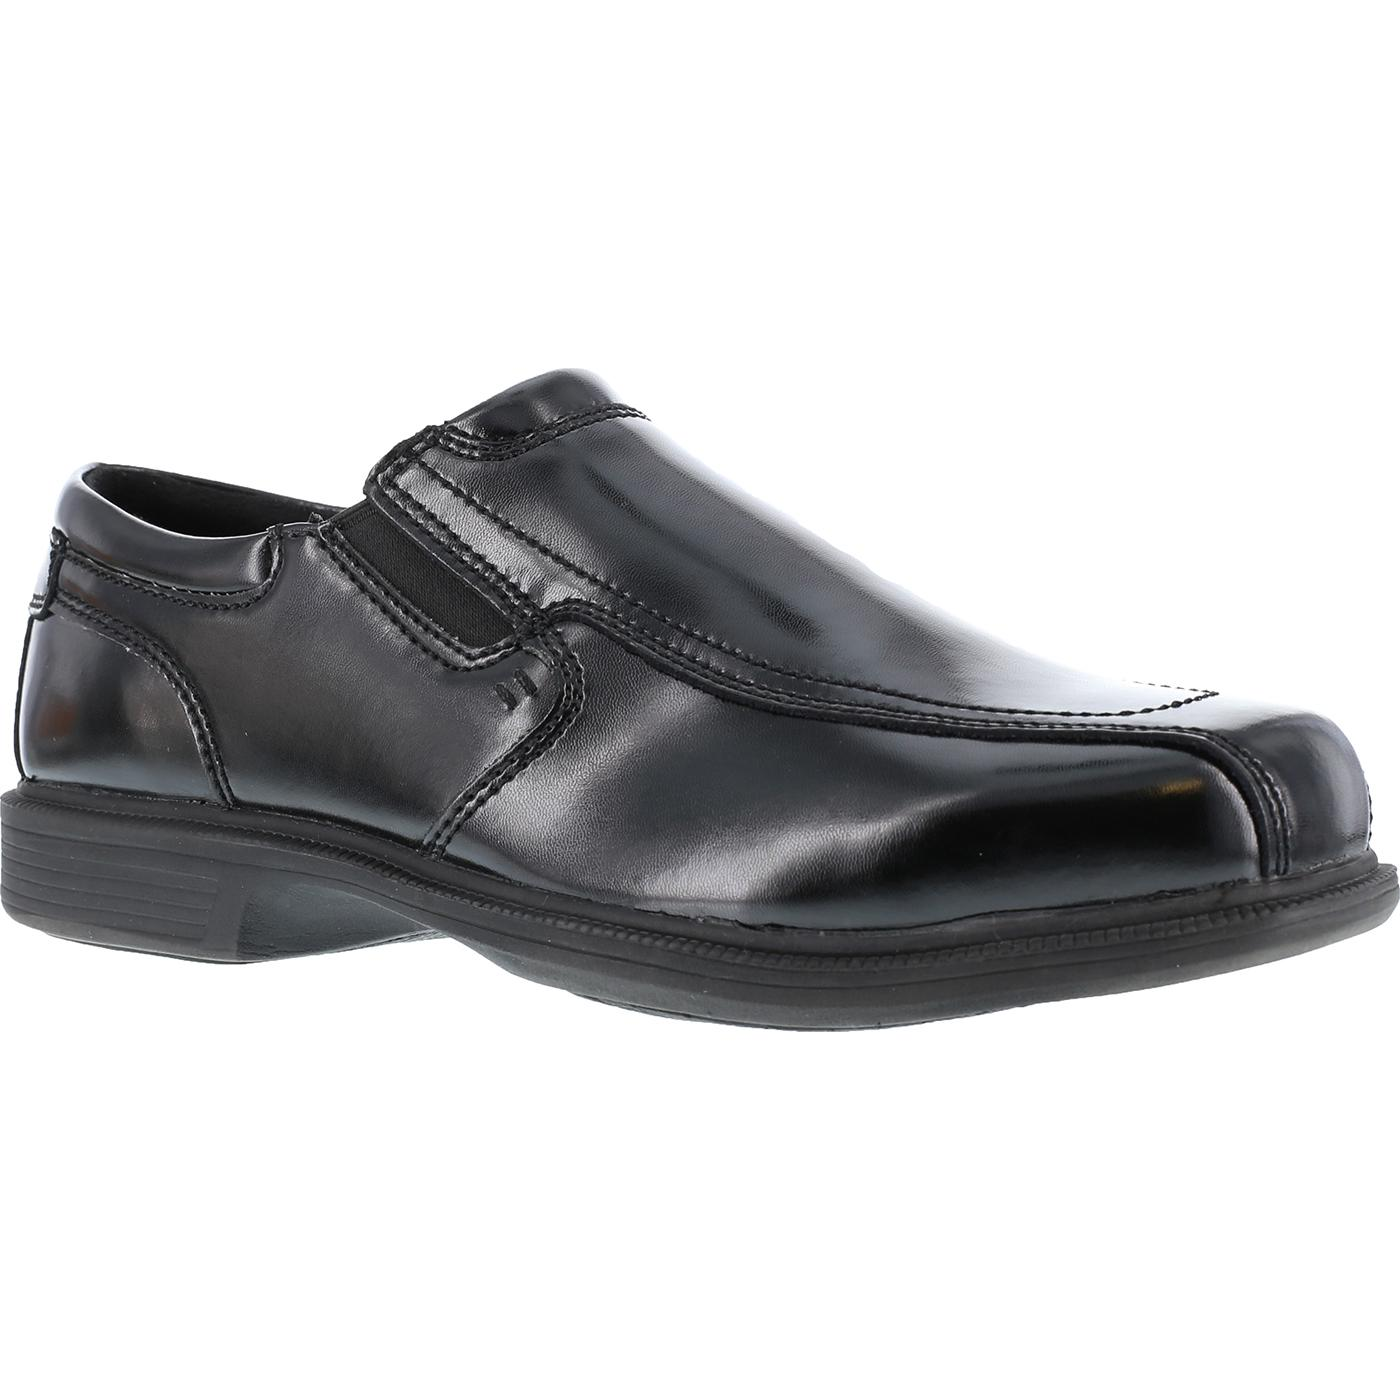 Florsheim Slip On Safety Shoes